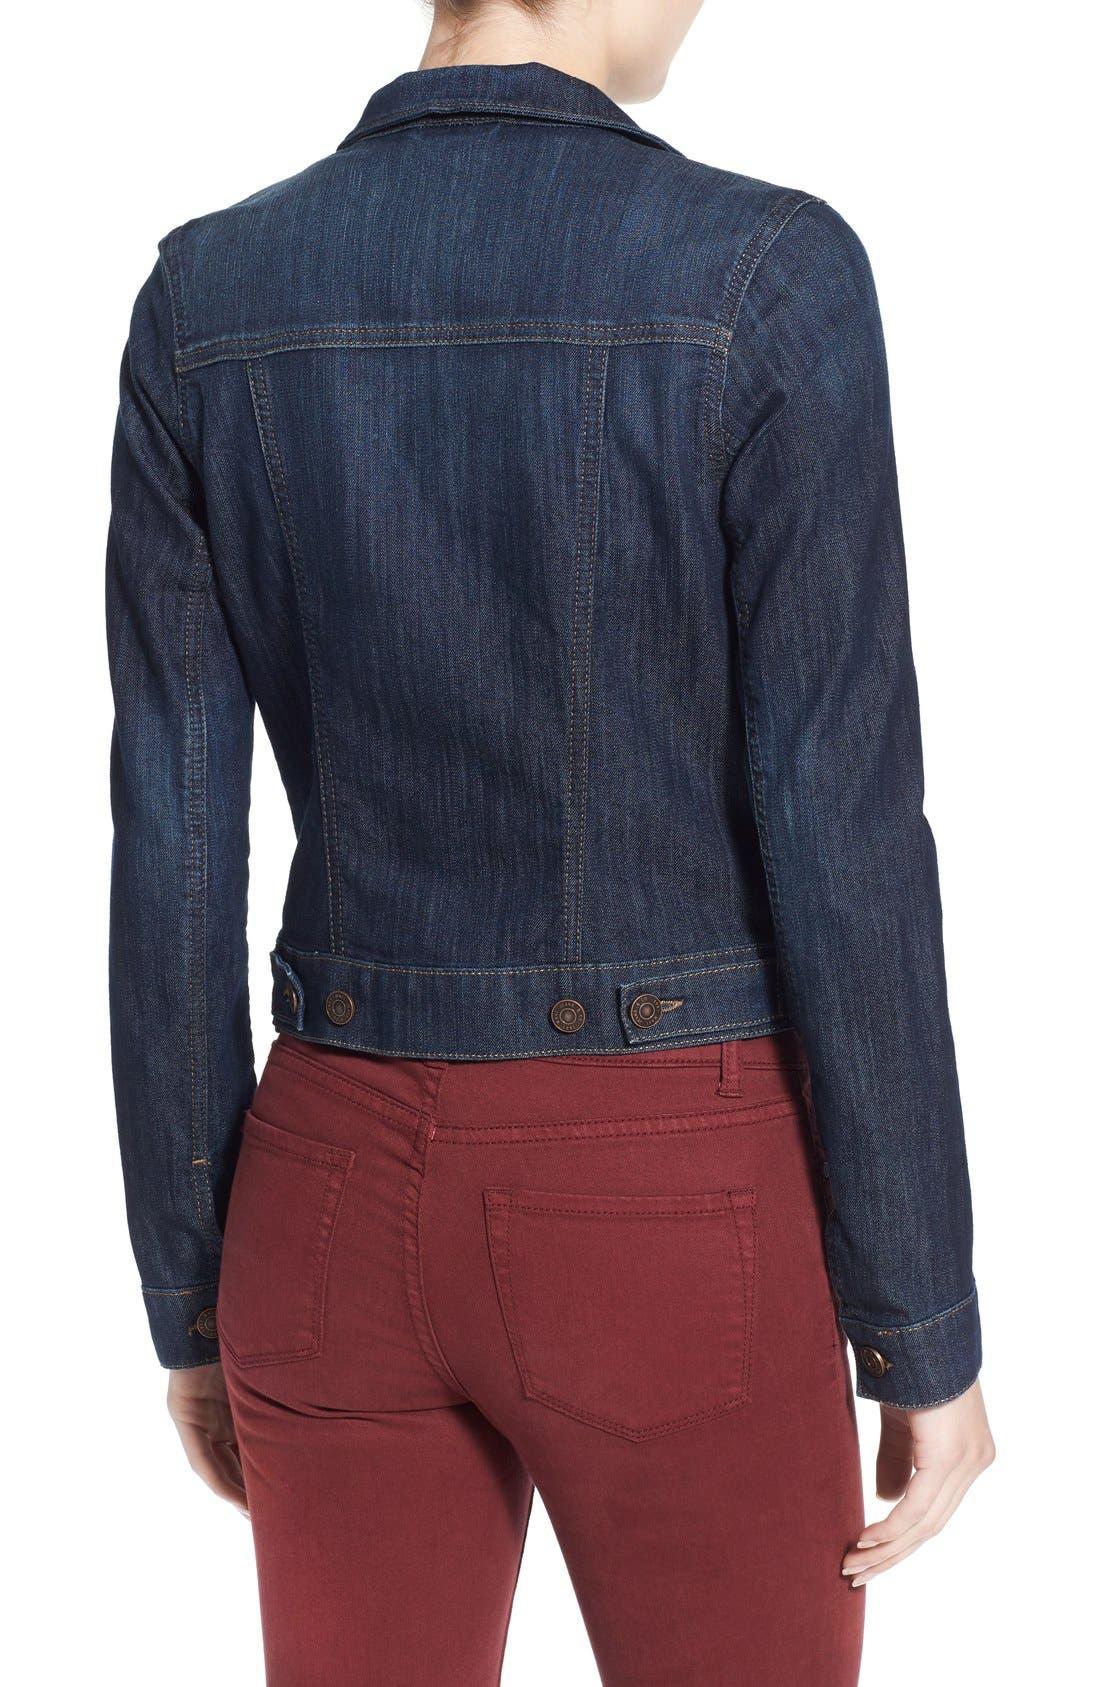 4b74dba6be8 Women s Button Coats   Jackets